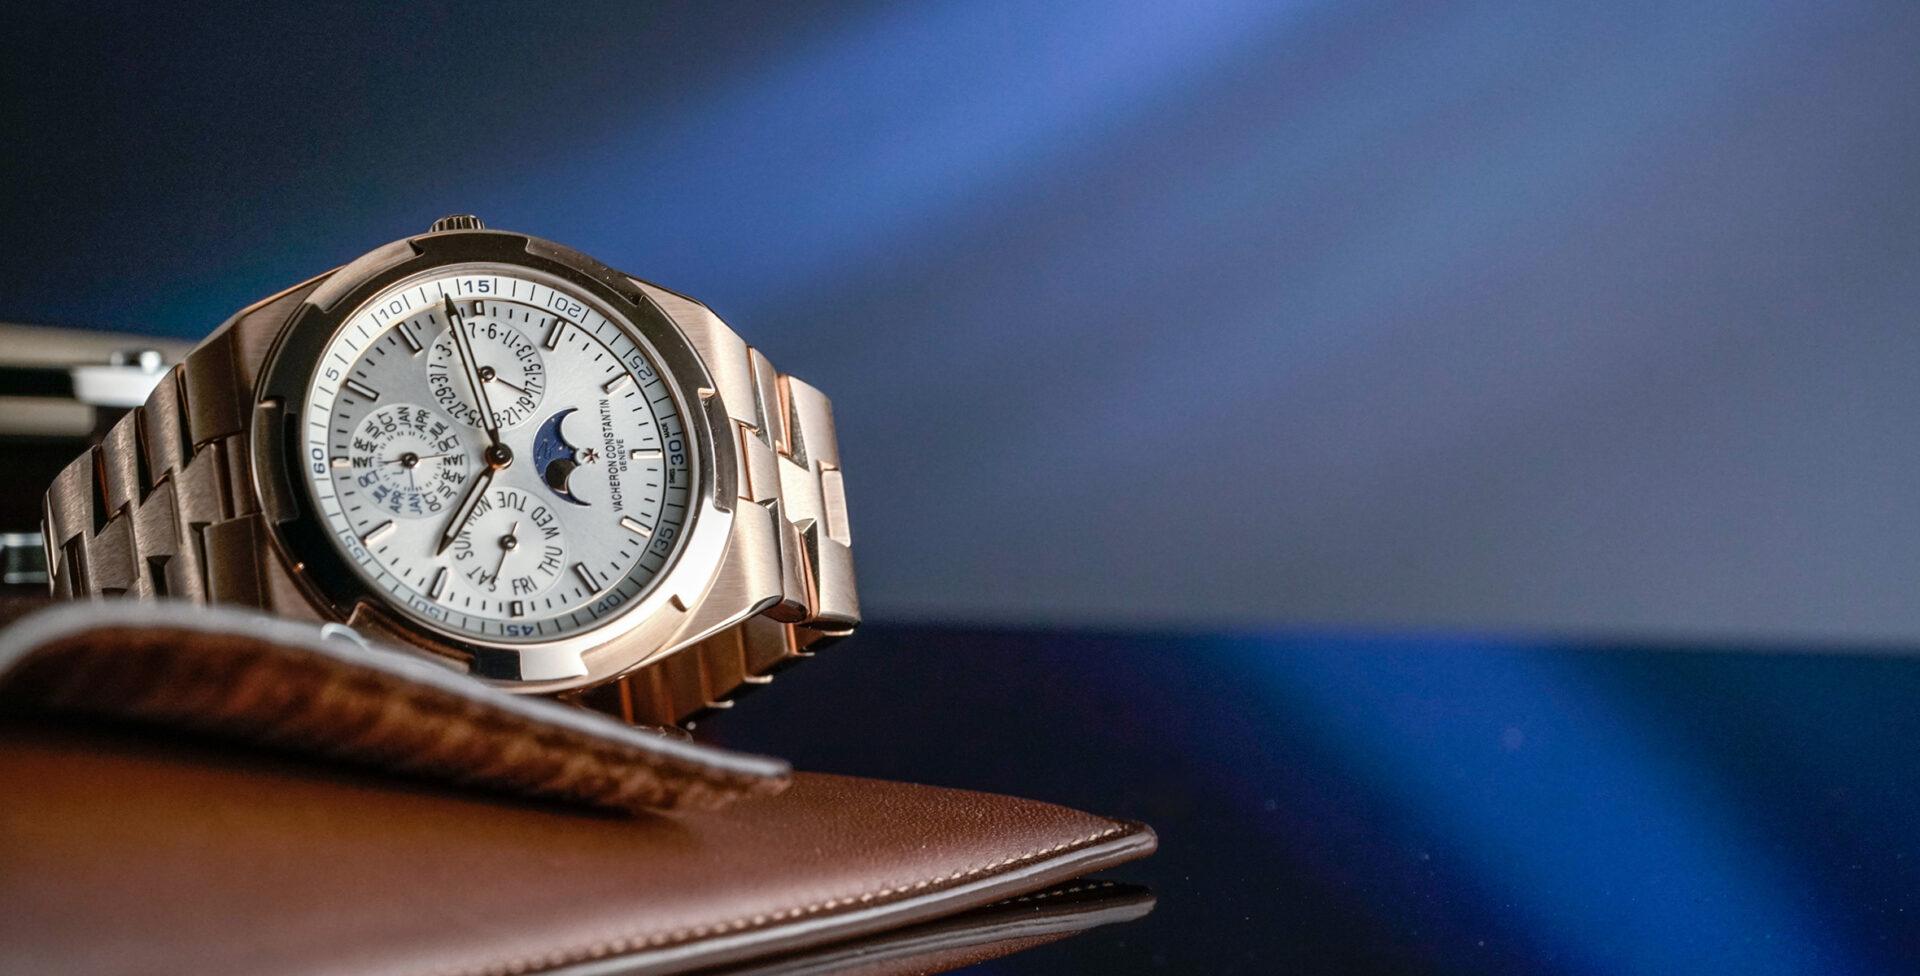 HANDS-ON: The Vacheron Constantin Overseas Perpetual Calendar Ultra-Thin – now on a fully gold bracelet